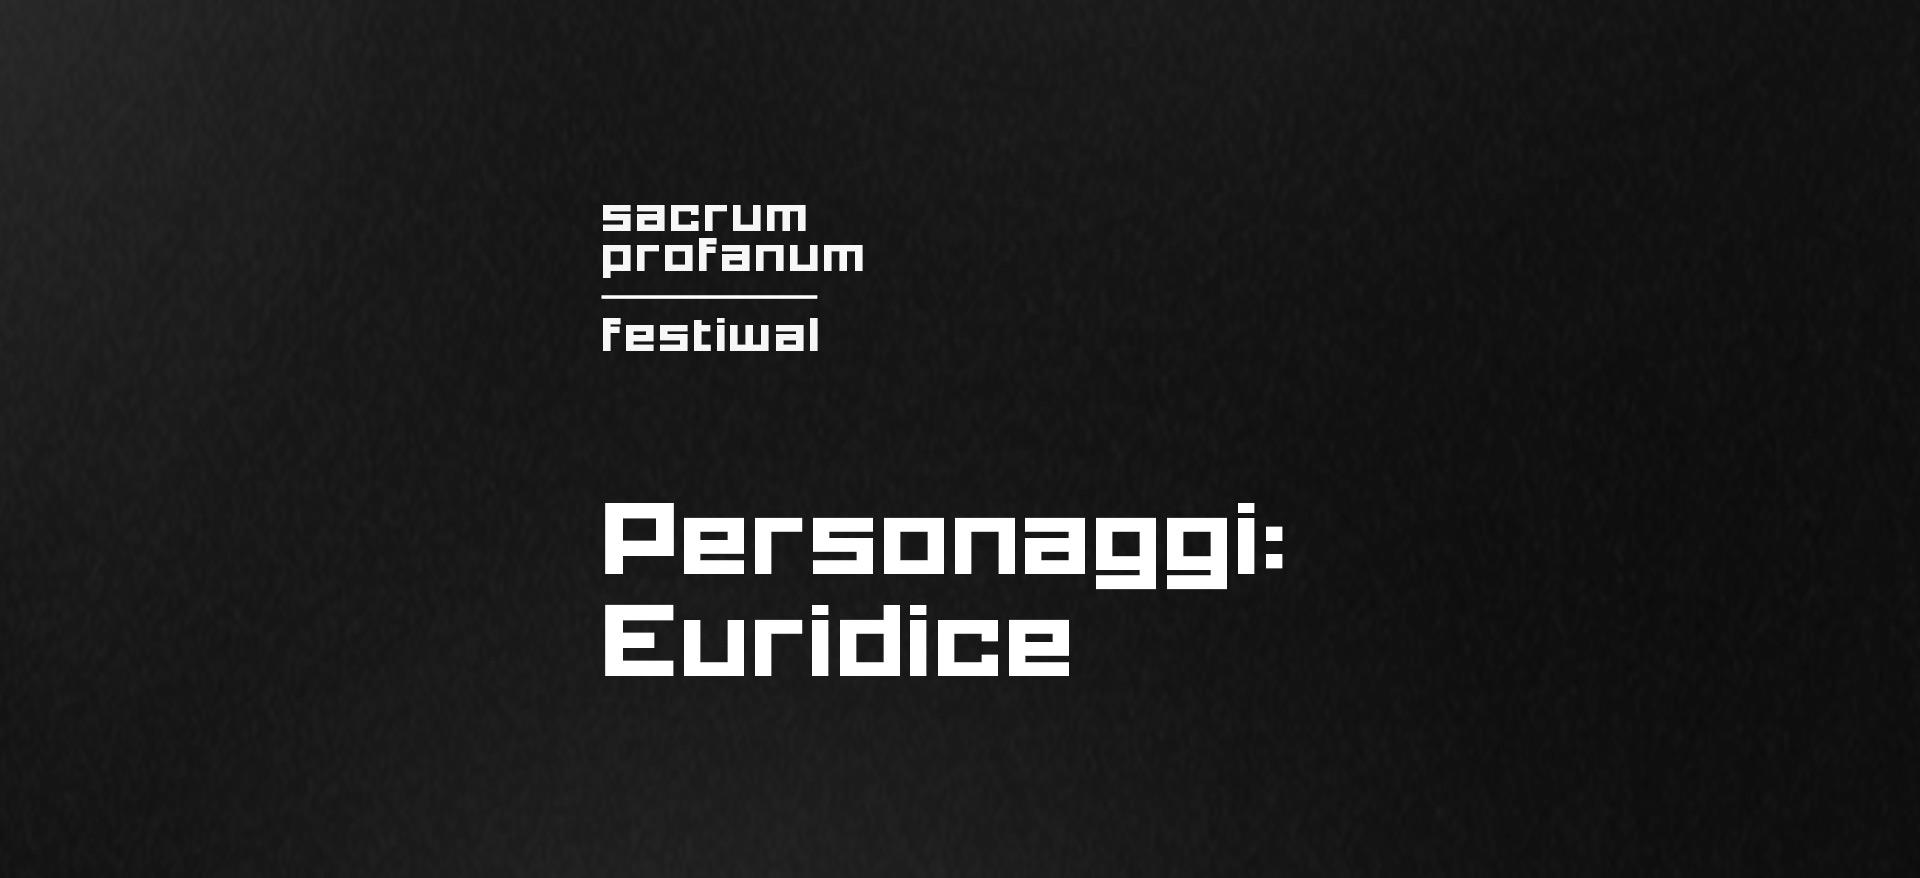 Festiwal Sacrum Profanum (źródło: materiały prasowe organizatora)